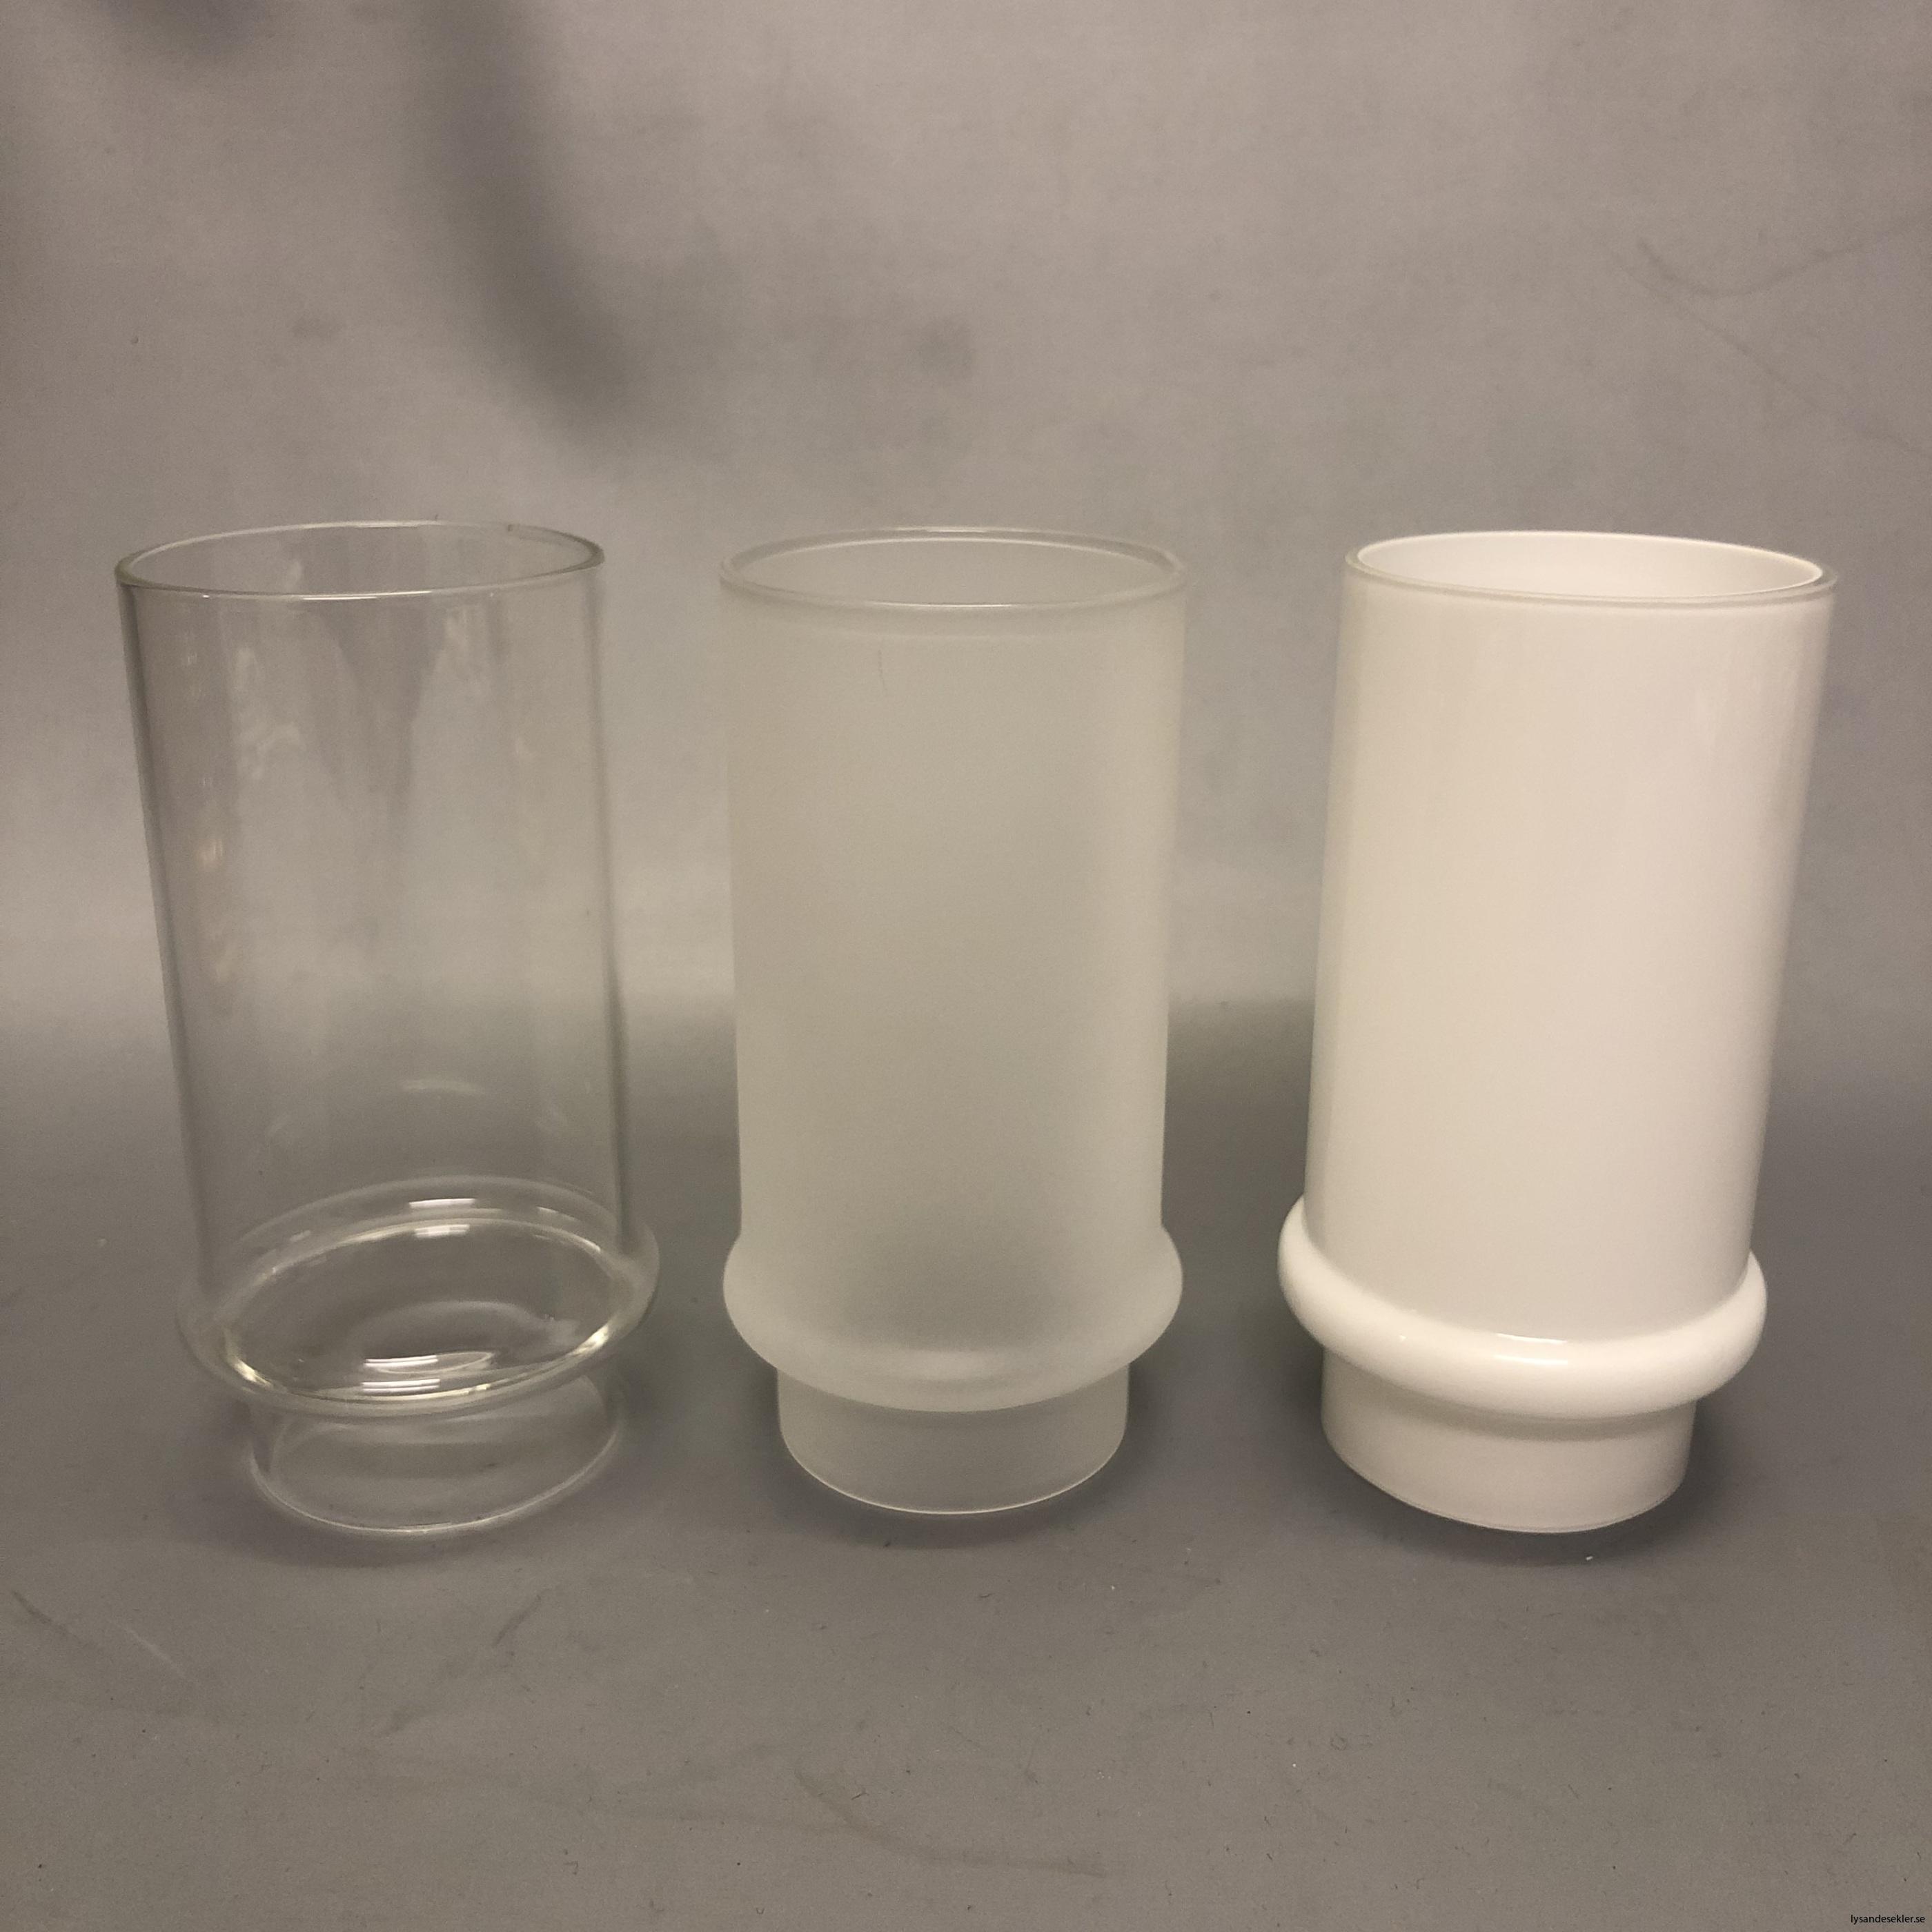 ellipse glas till oljelampa1